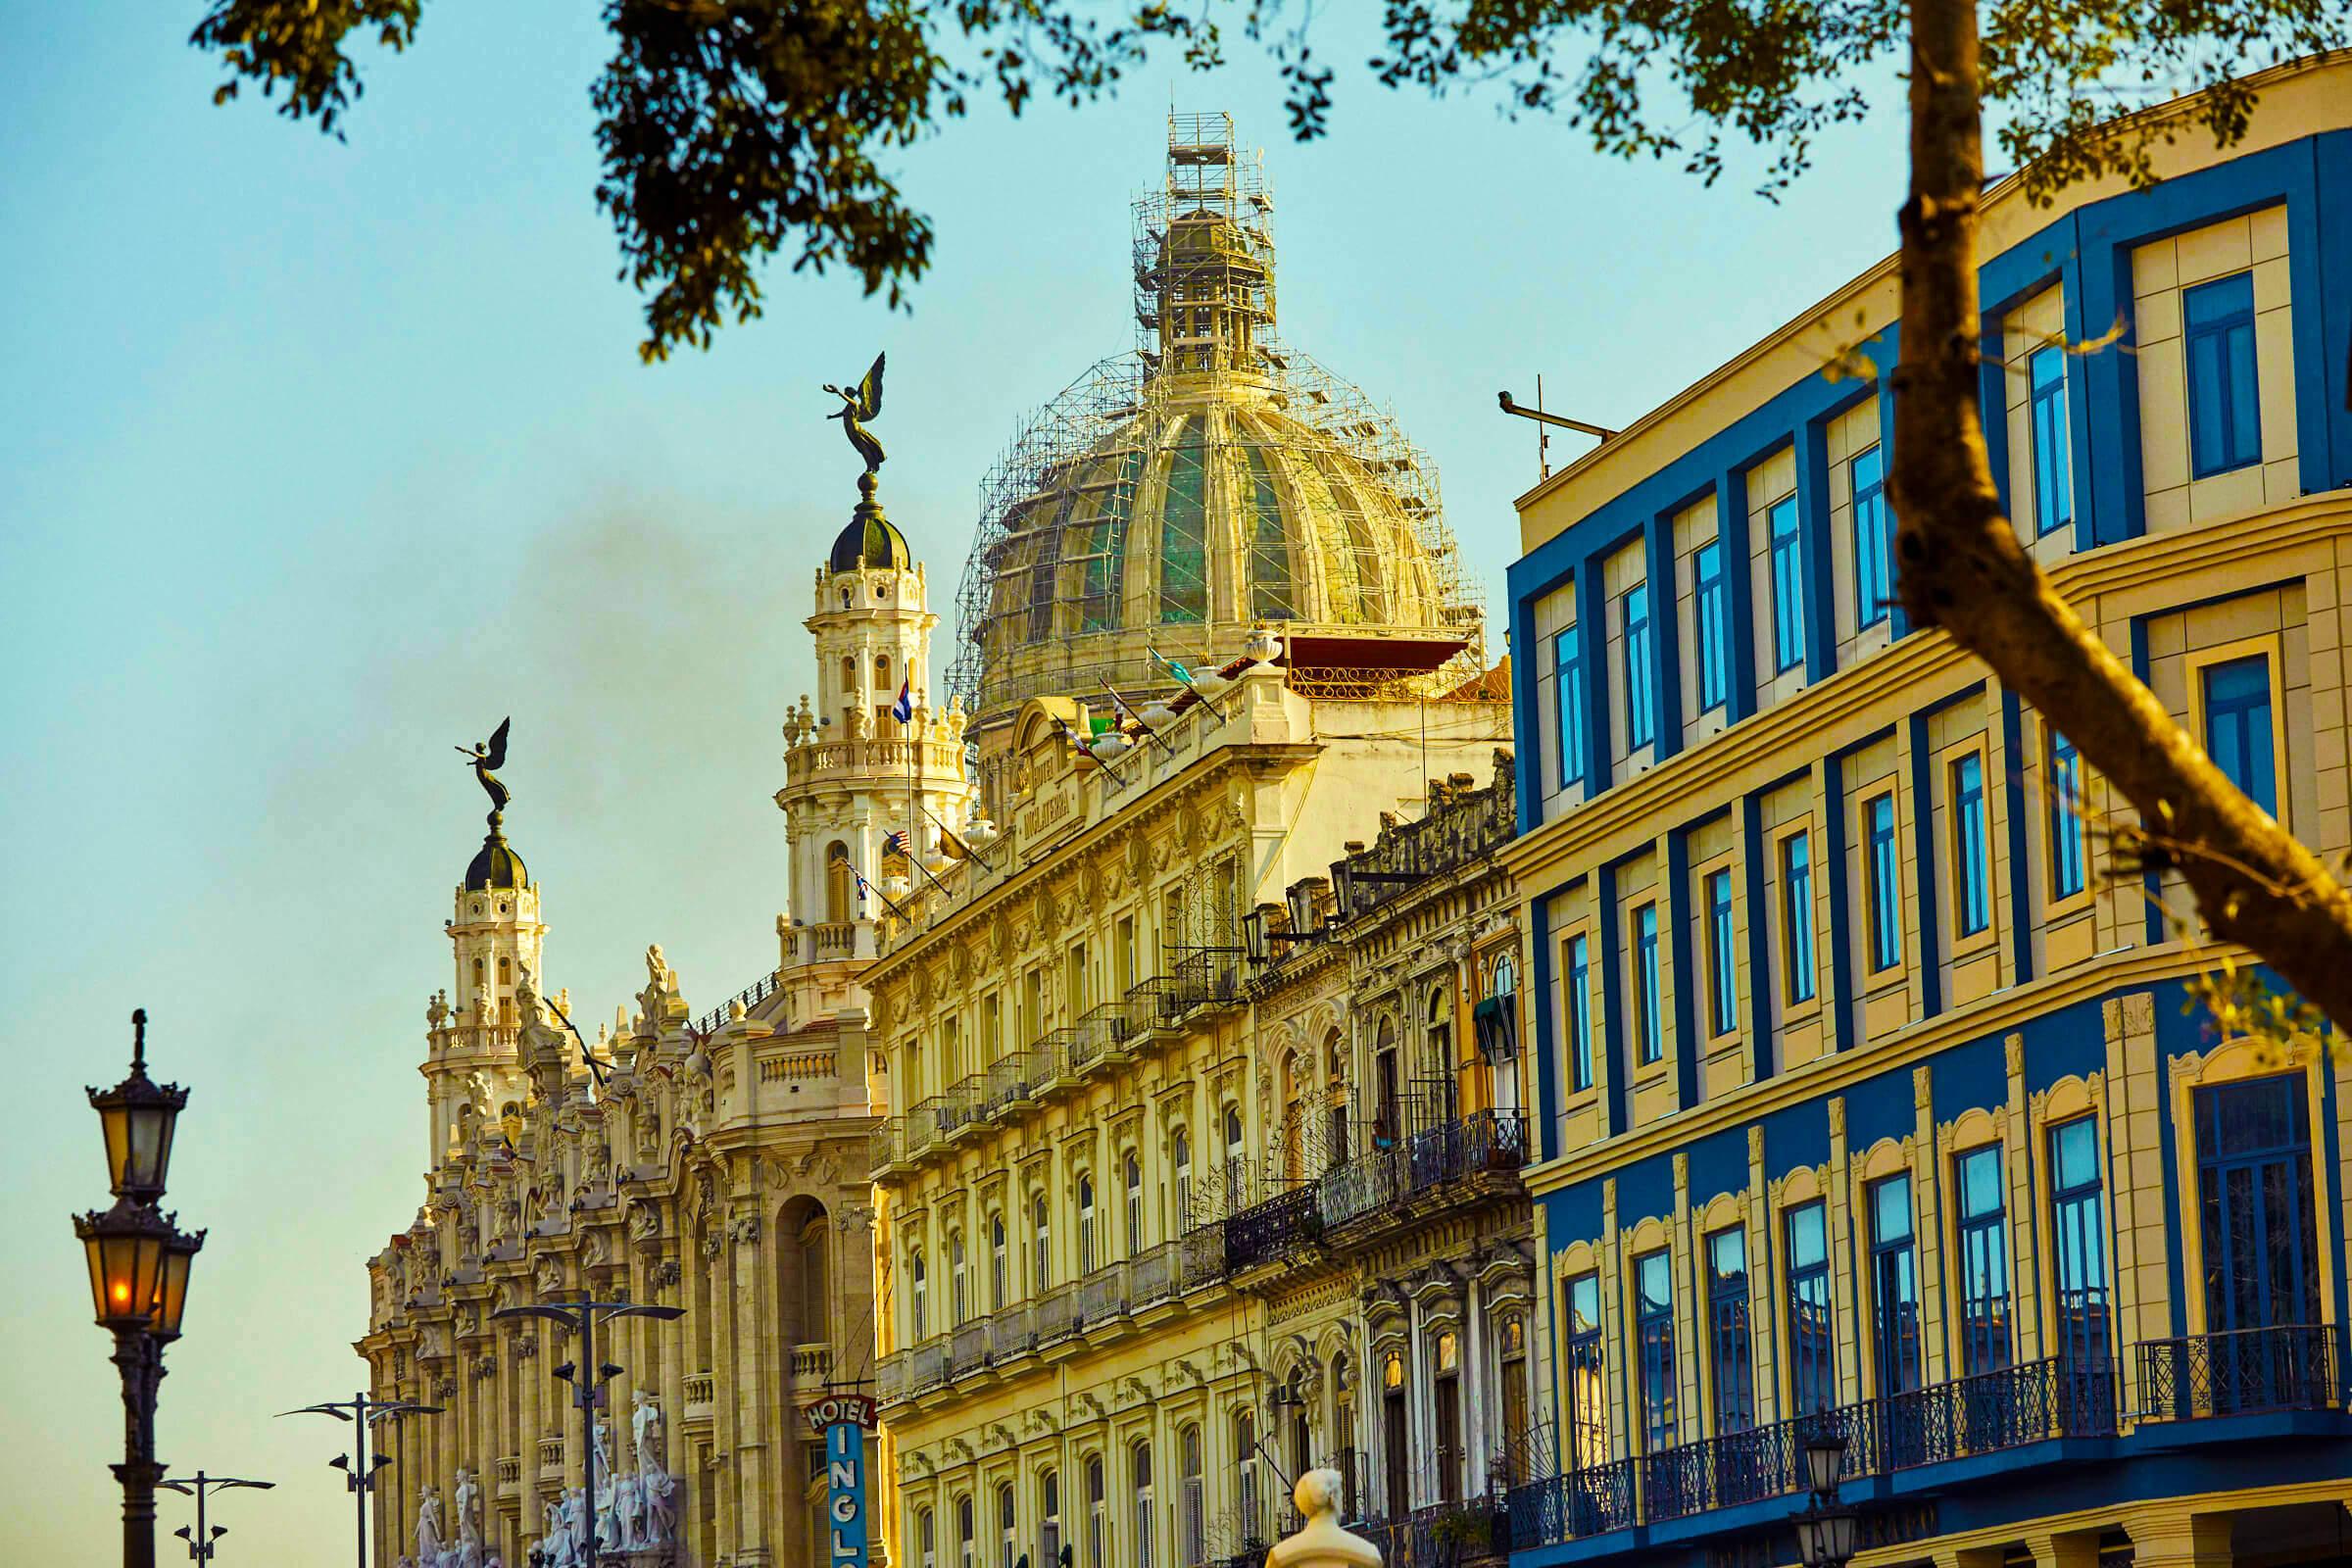 cuba_grand_architecture_el_capitolio_havana.jpg